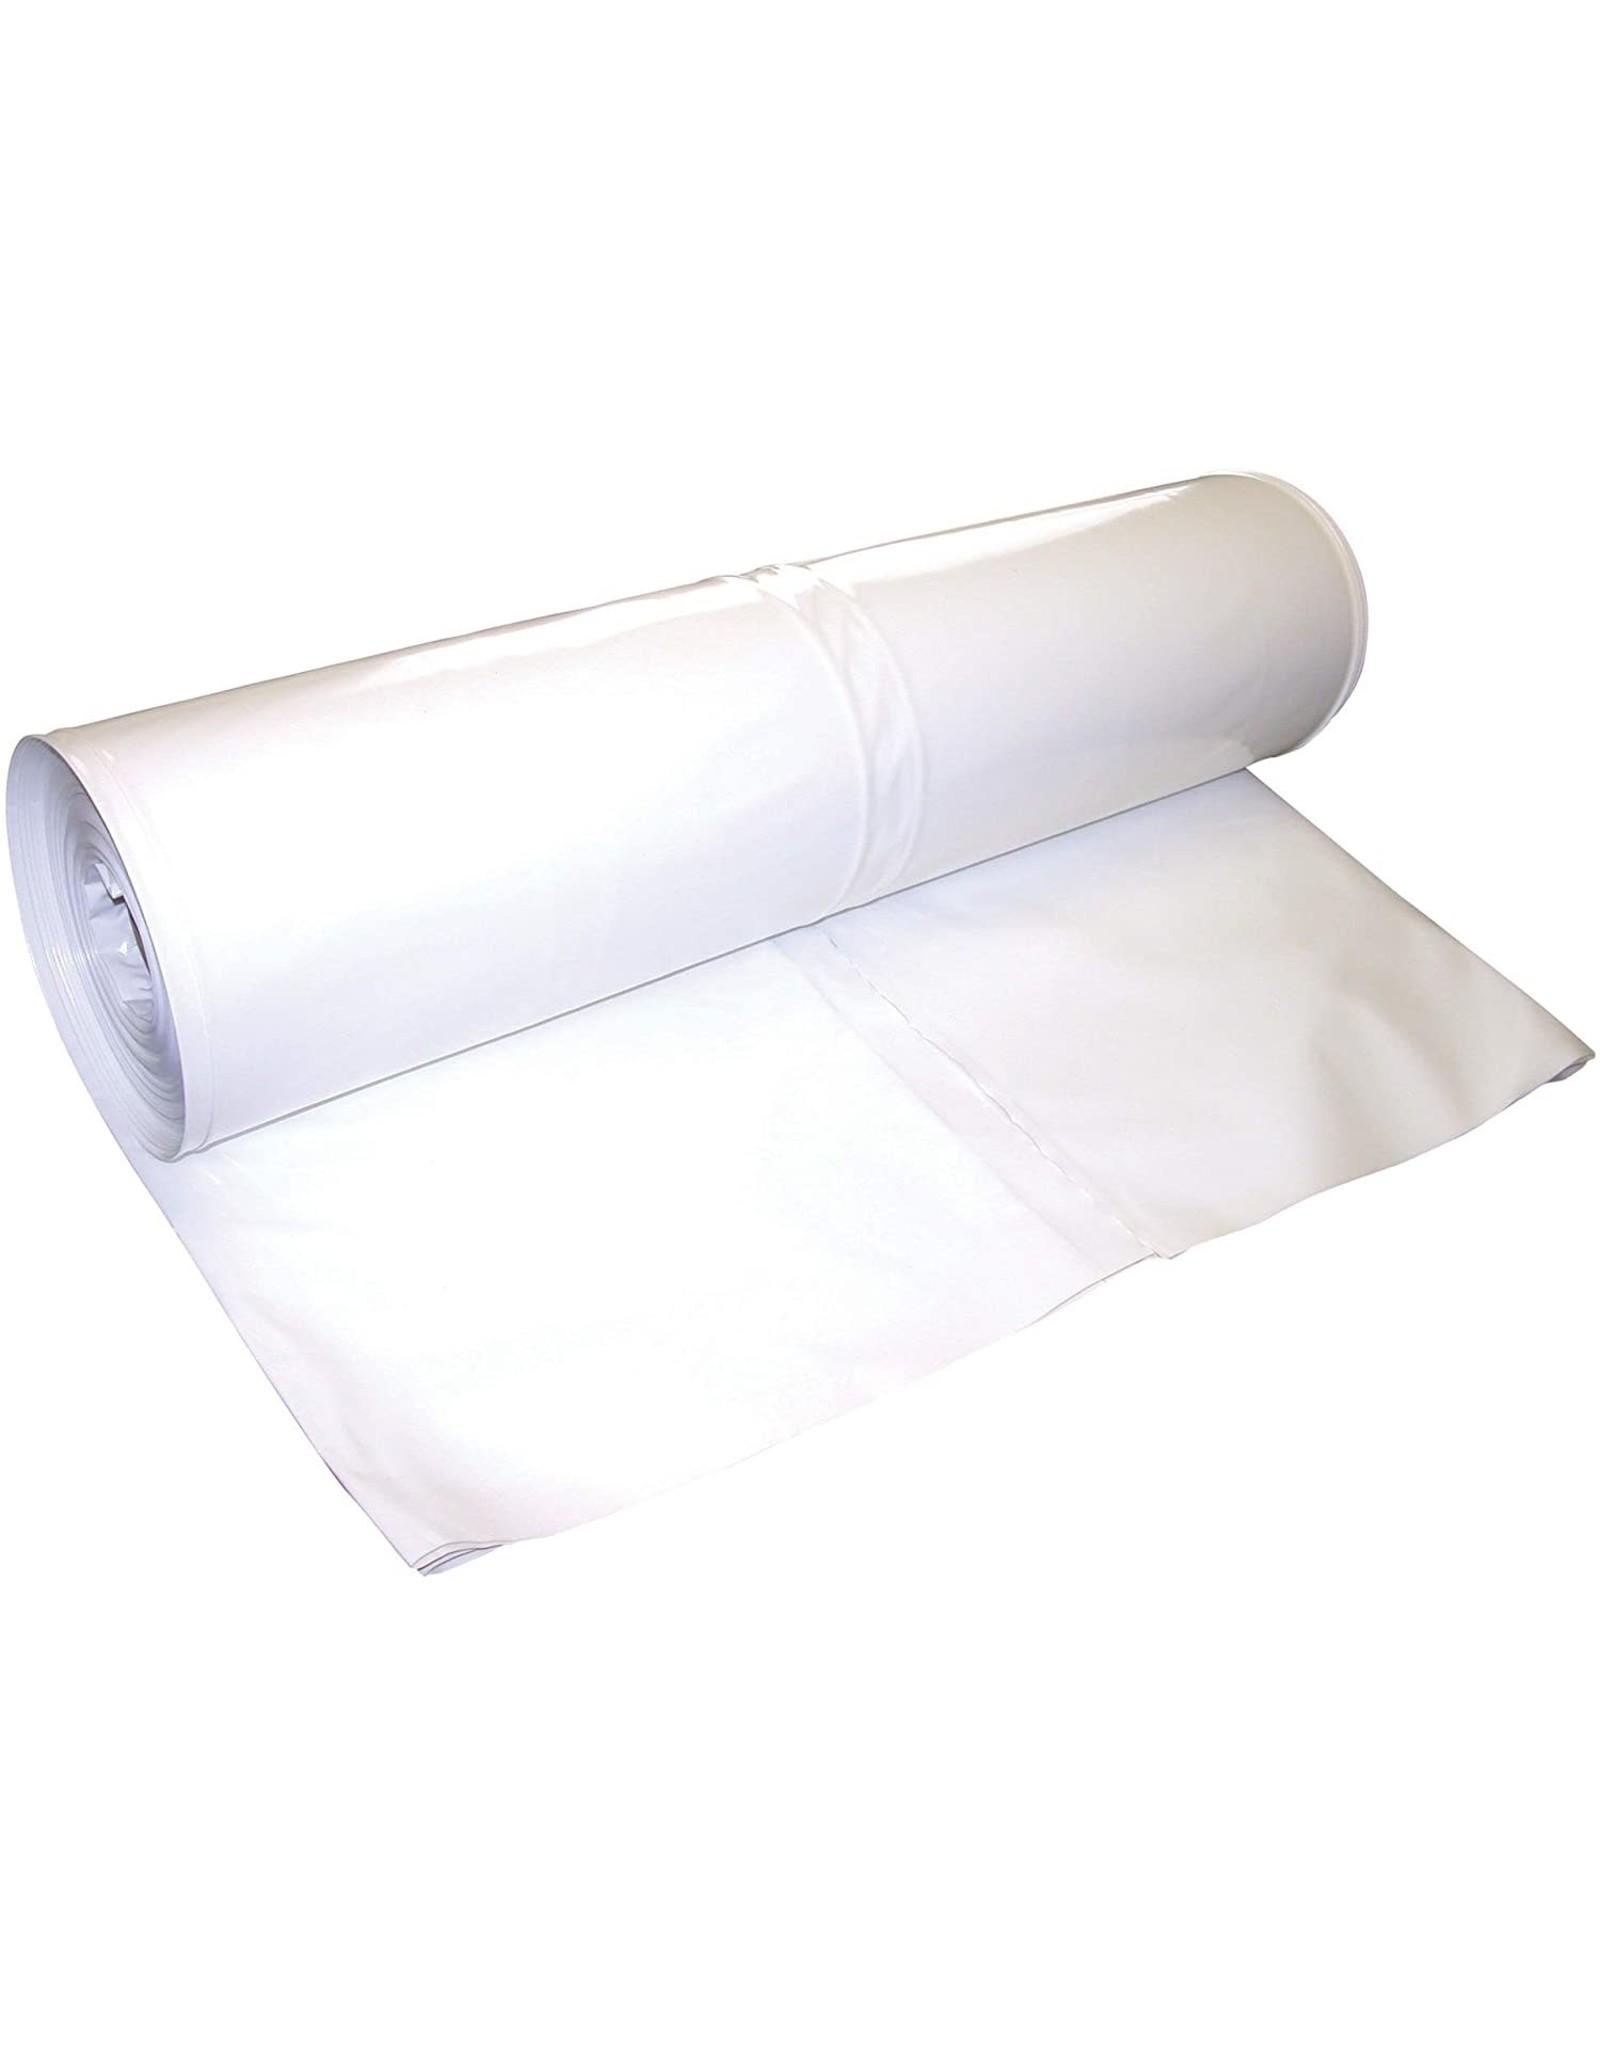 Dr. Shrink Dr. Shrink DS-177110W 7-mil Shrink Wrap - 17' x 110', White, Small